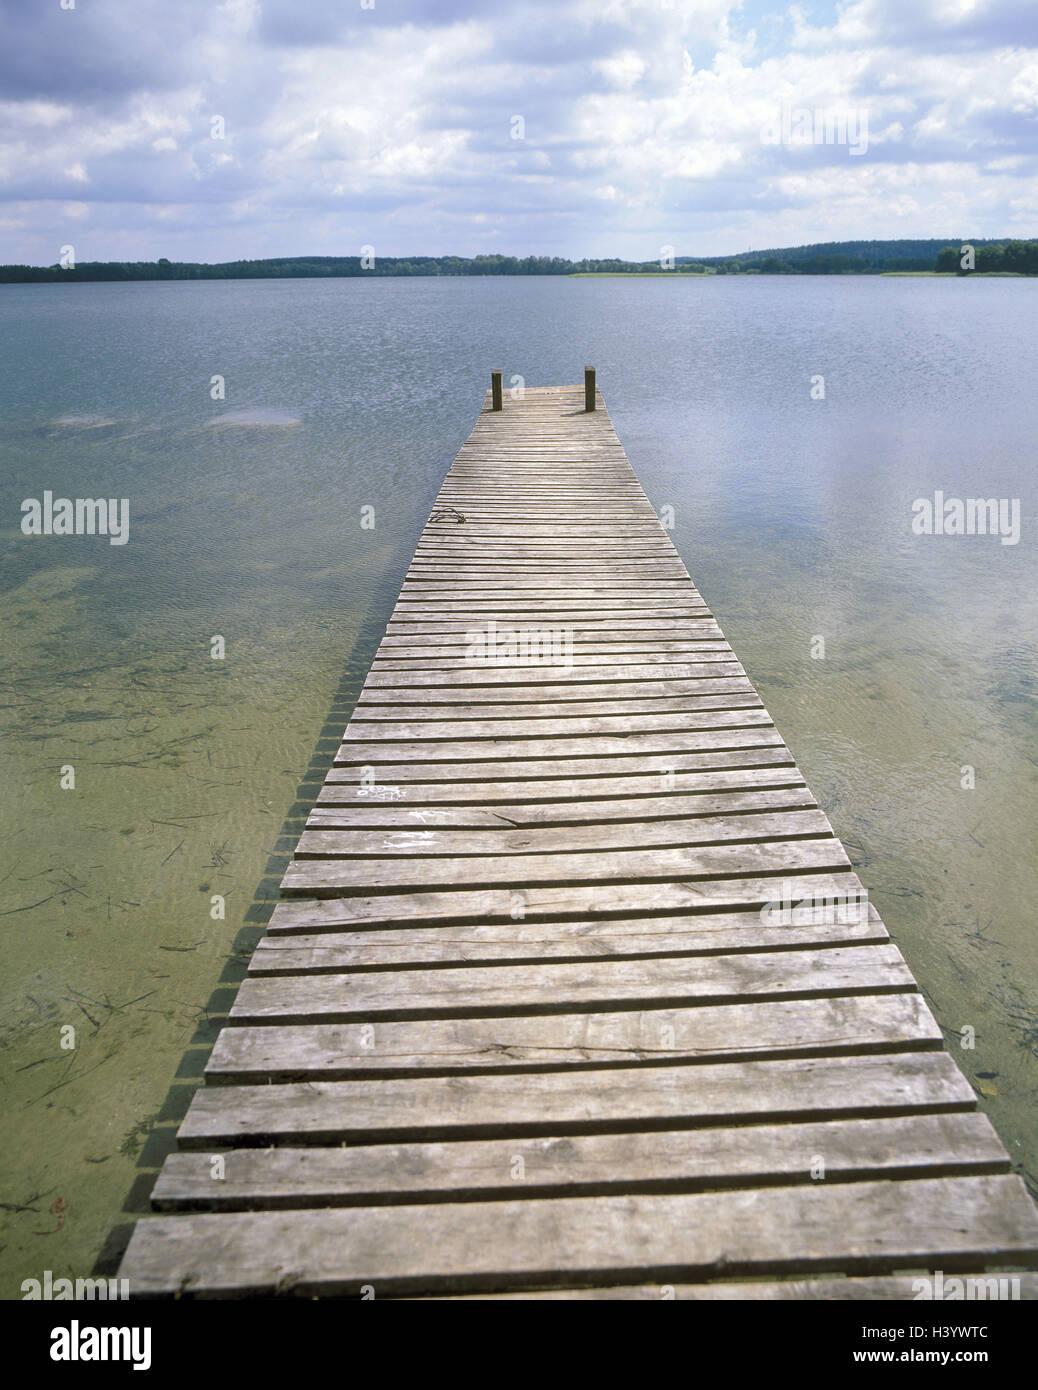 Poland, Olsztyn, lake, wooden jetty, Europe, East, Europe, East Prussia, Masuria, Allenstein, scenery, waters, bridge, - Stock Image